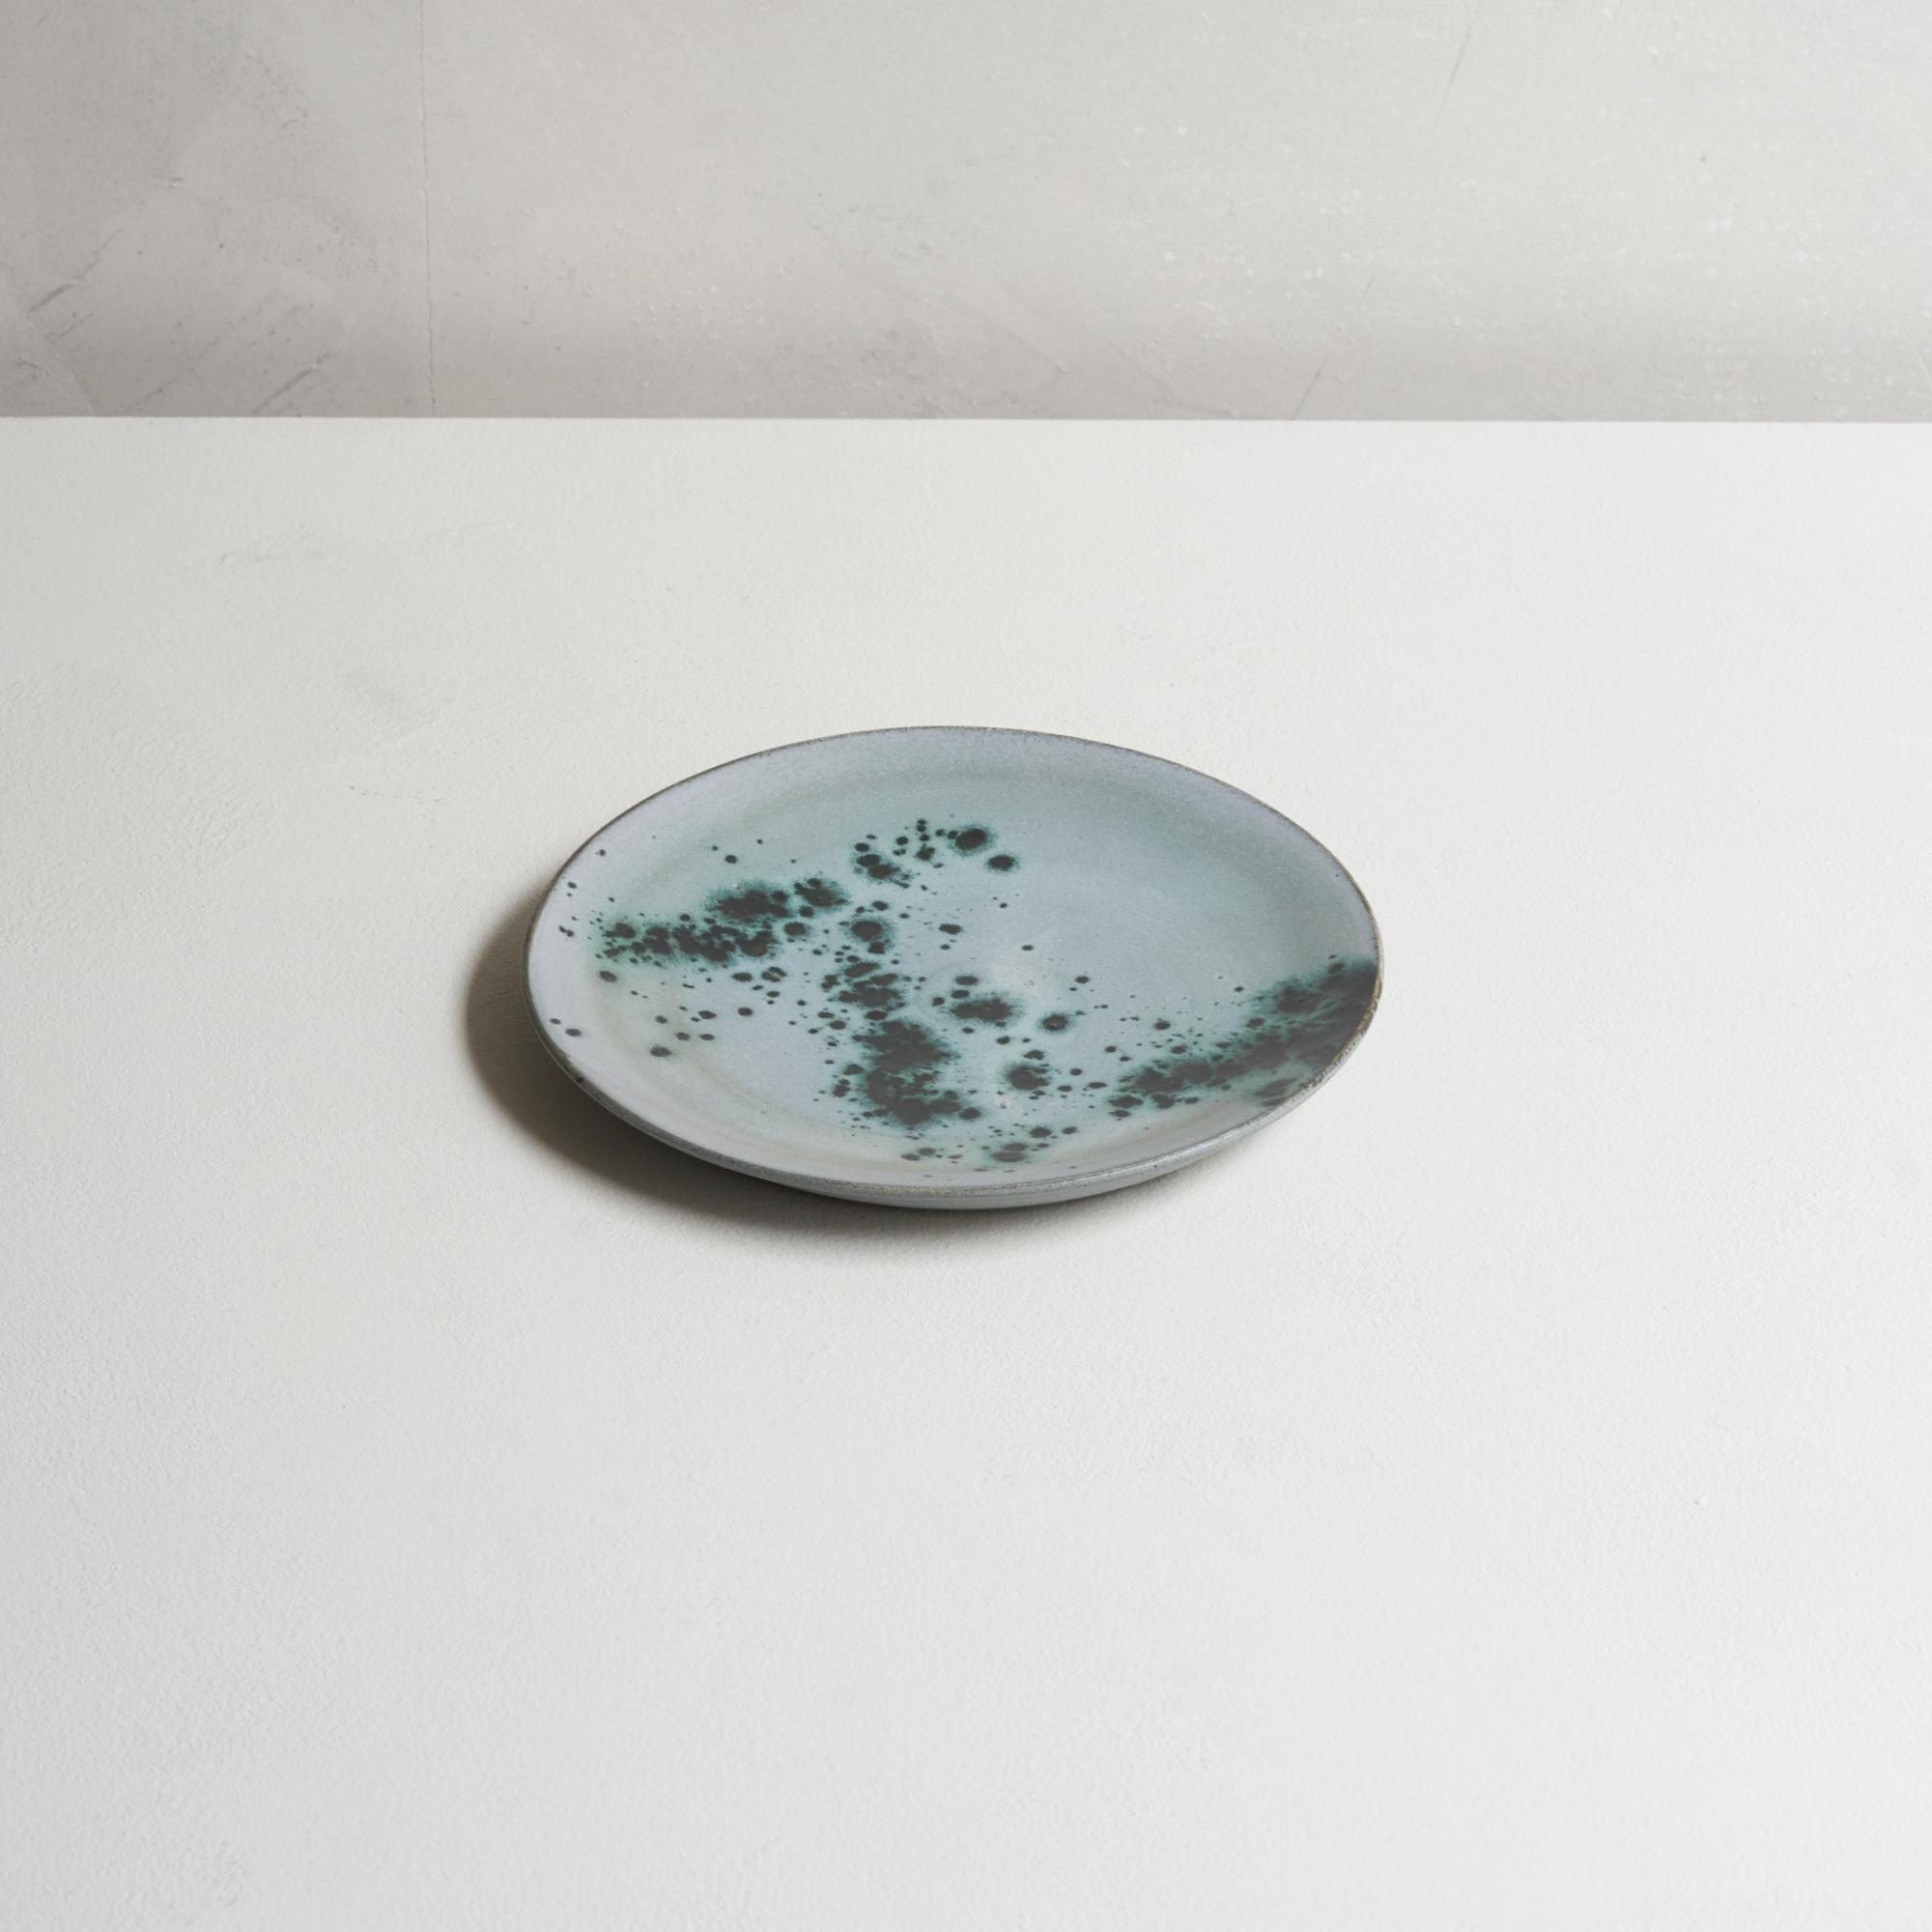 Anette Krogstad Lunch Plate